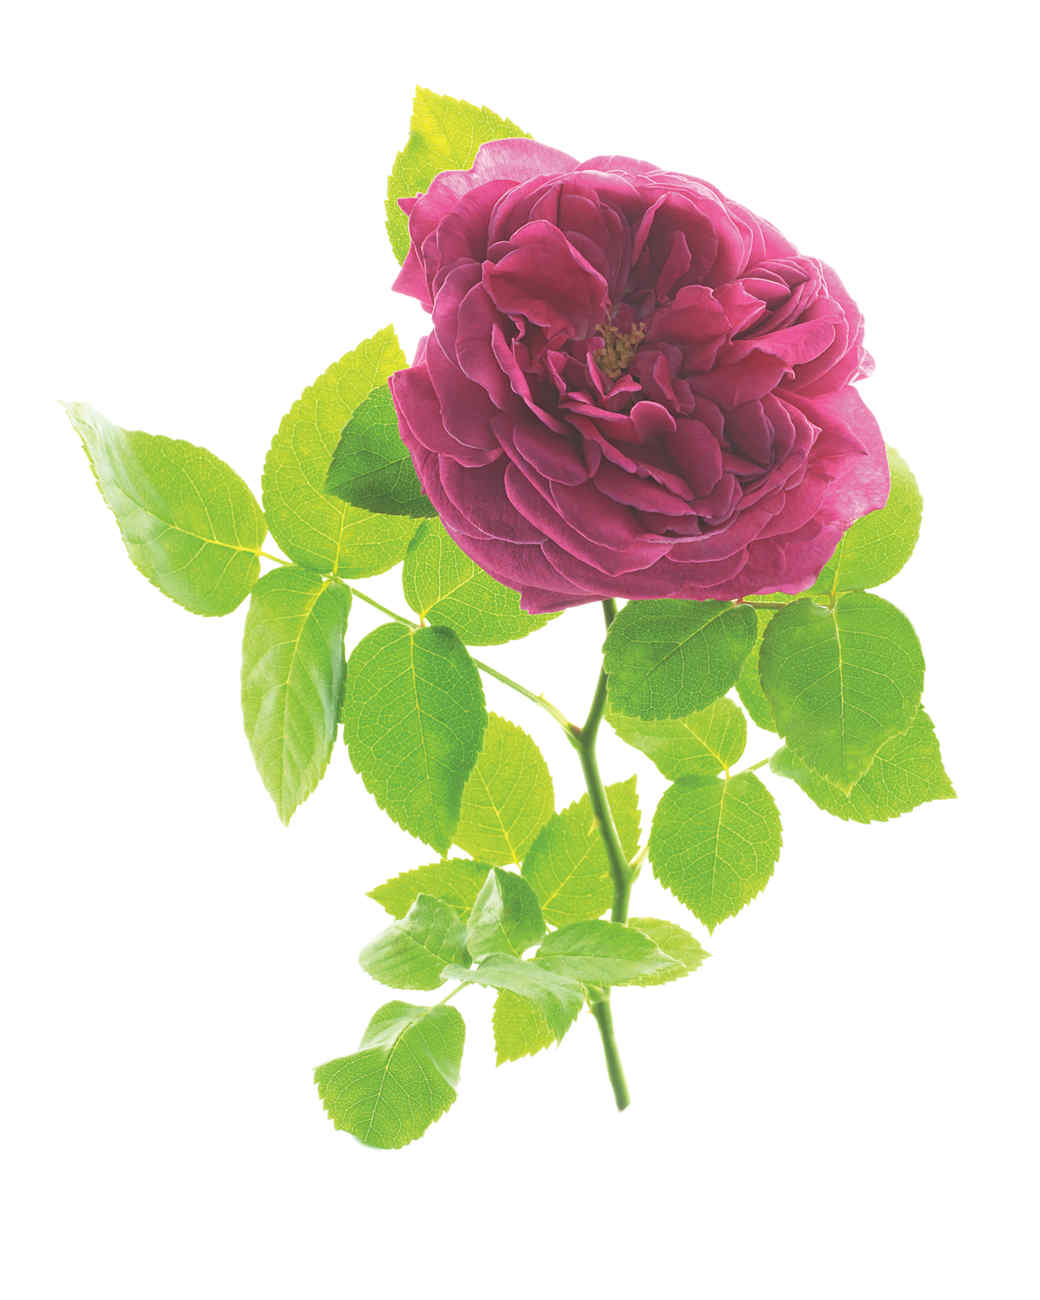 madame-isaac-pereire-rose-ms108508.jpg